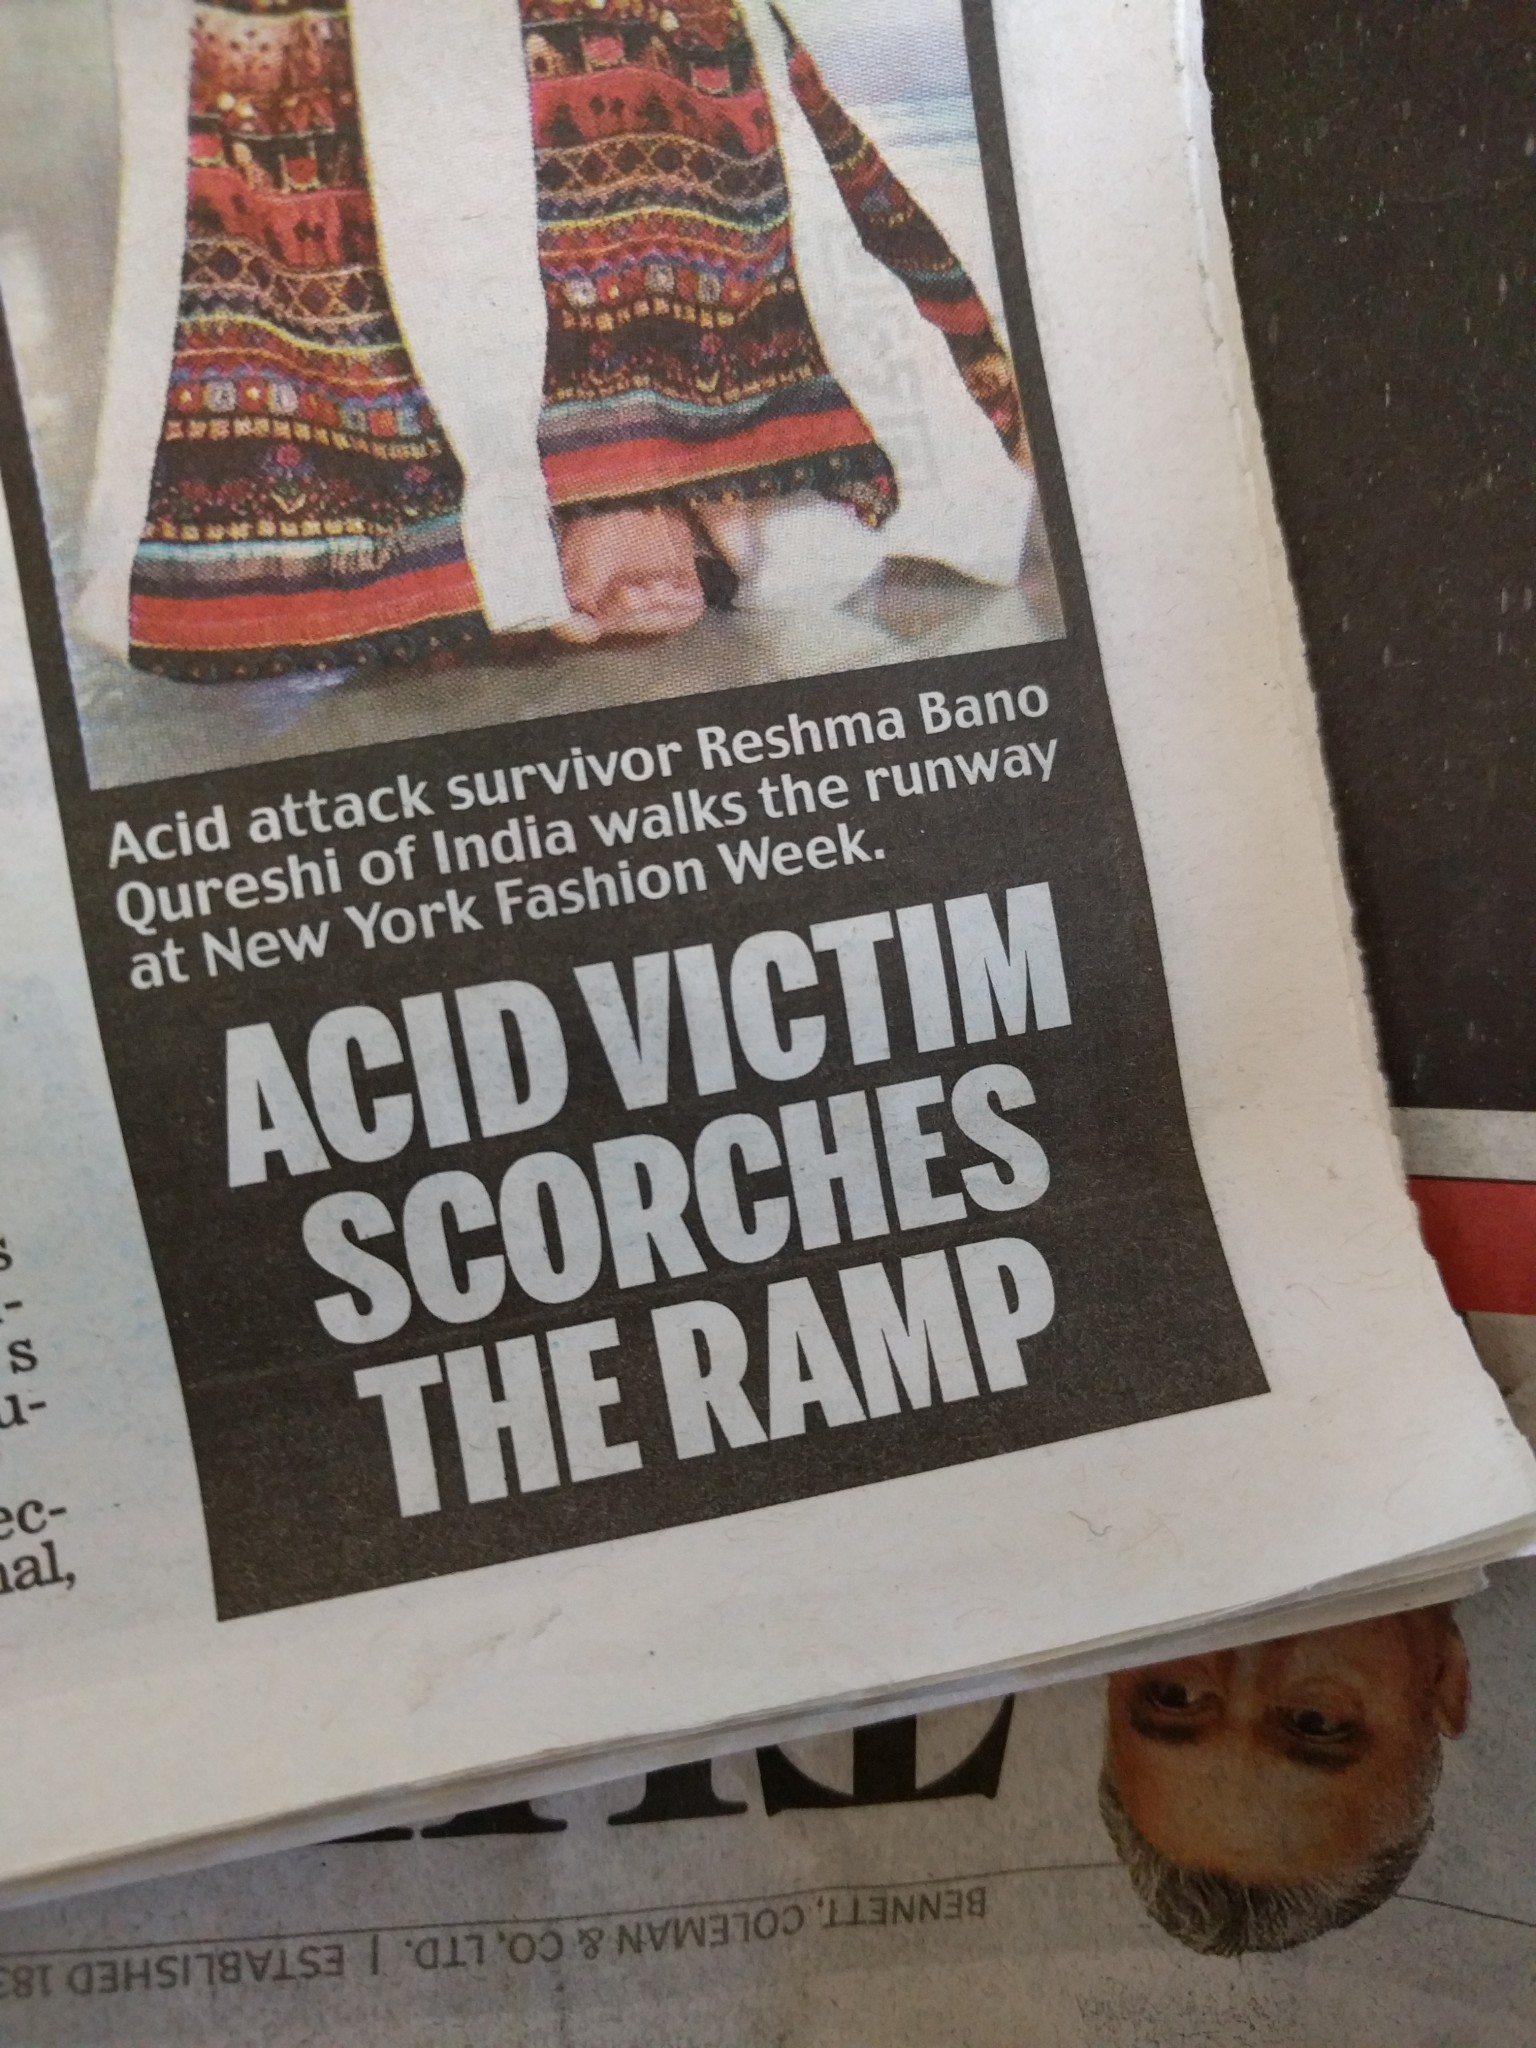 mail-today-headline